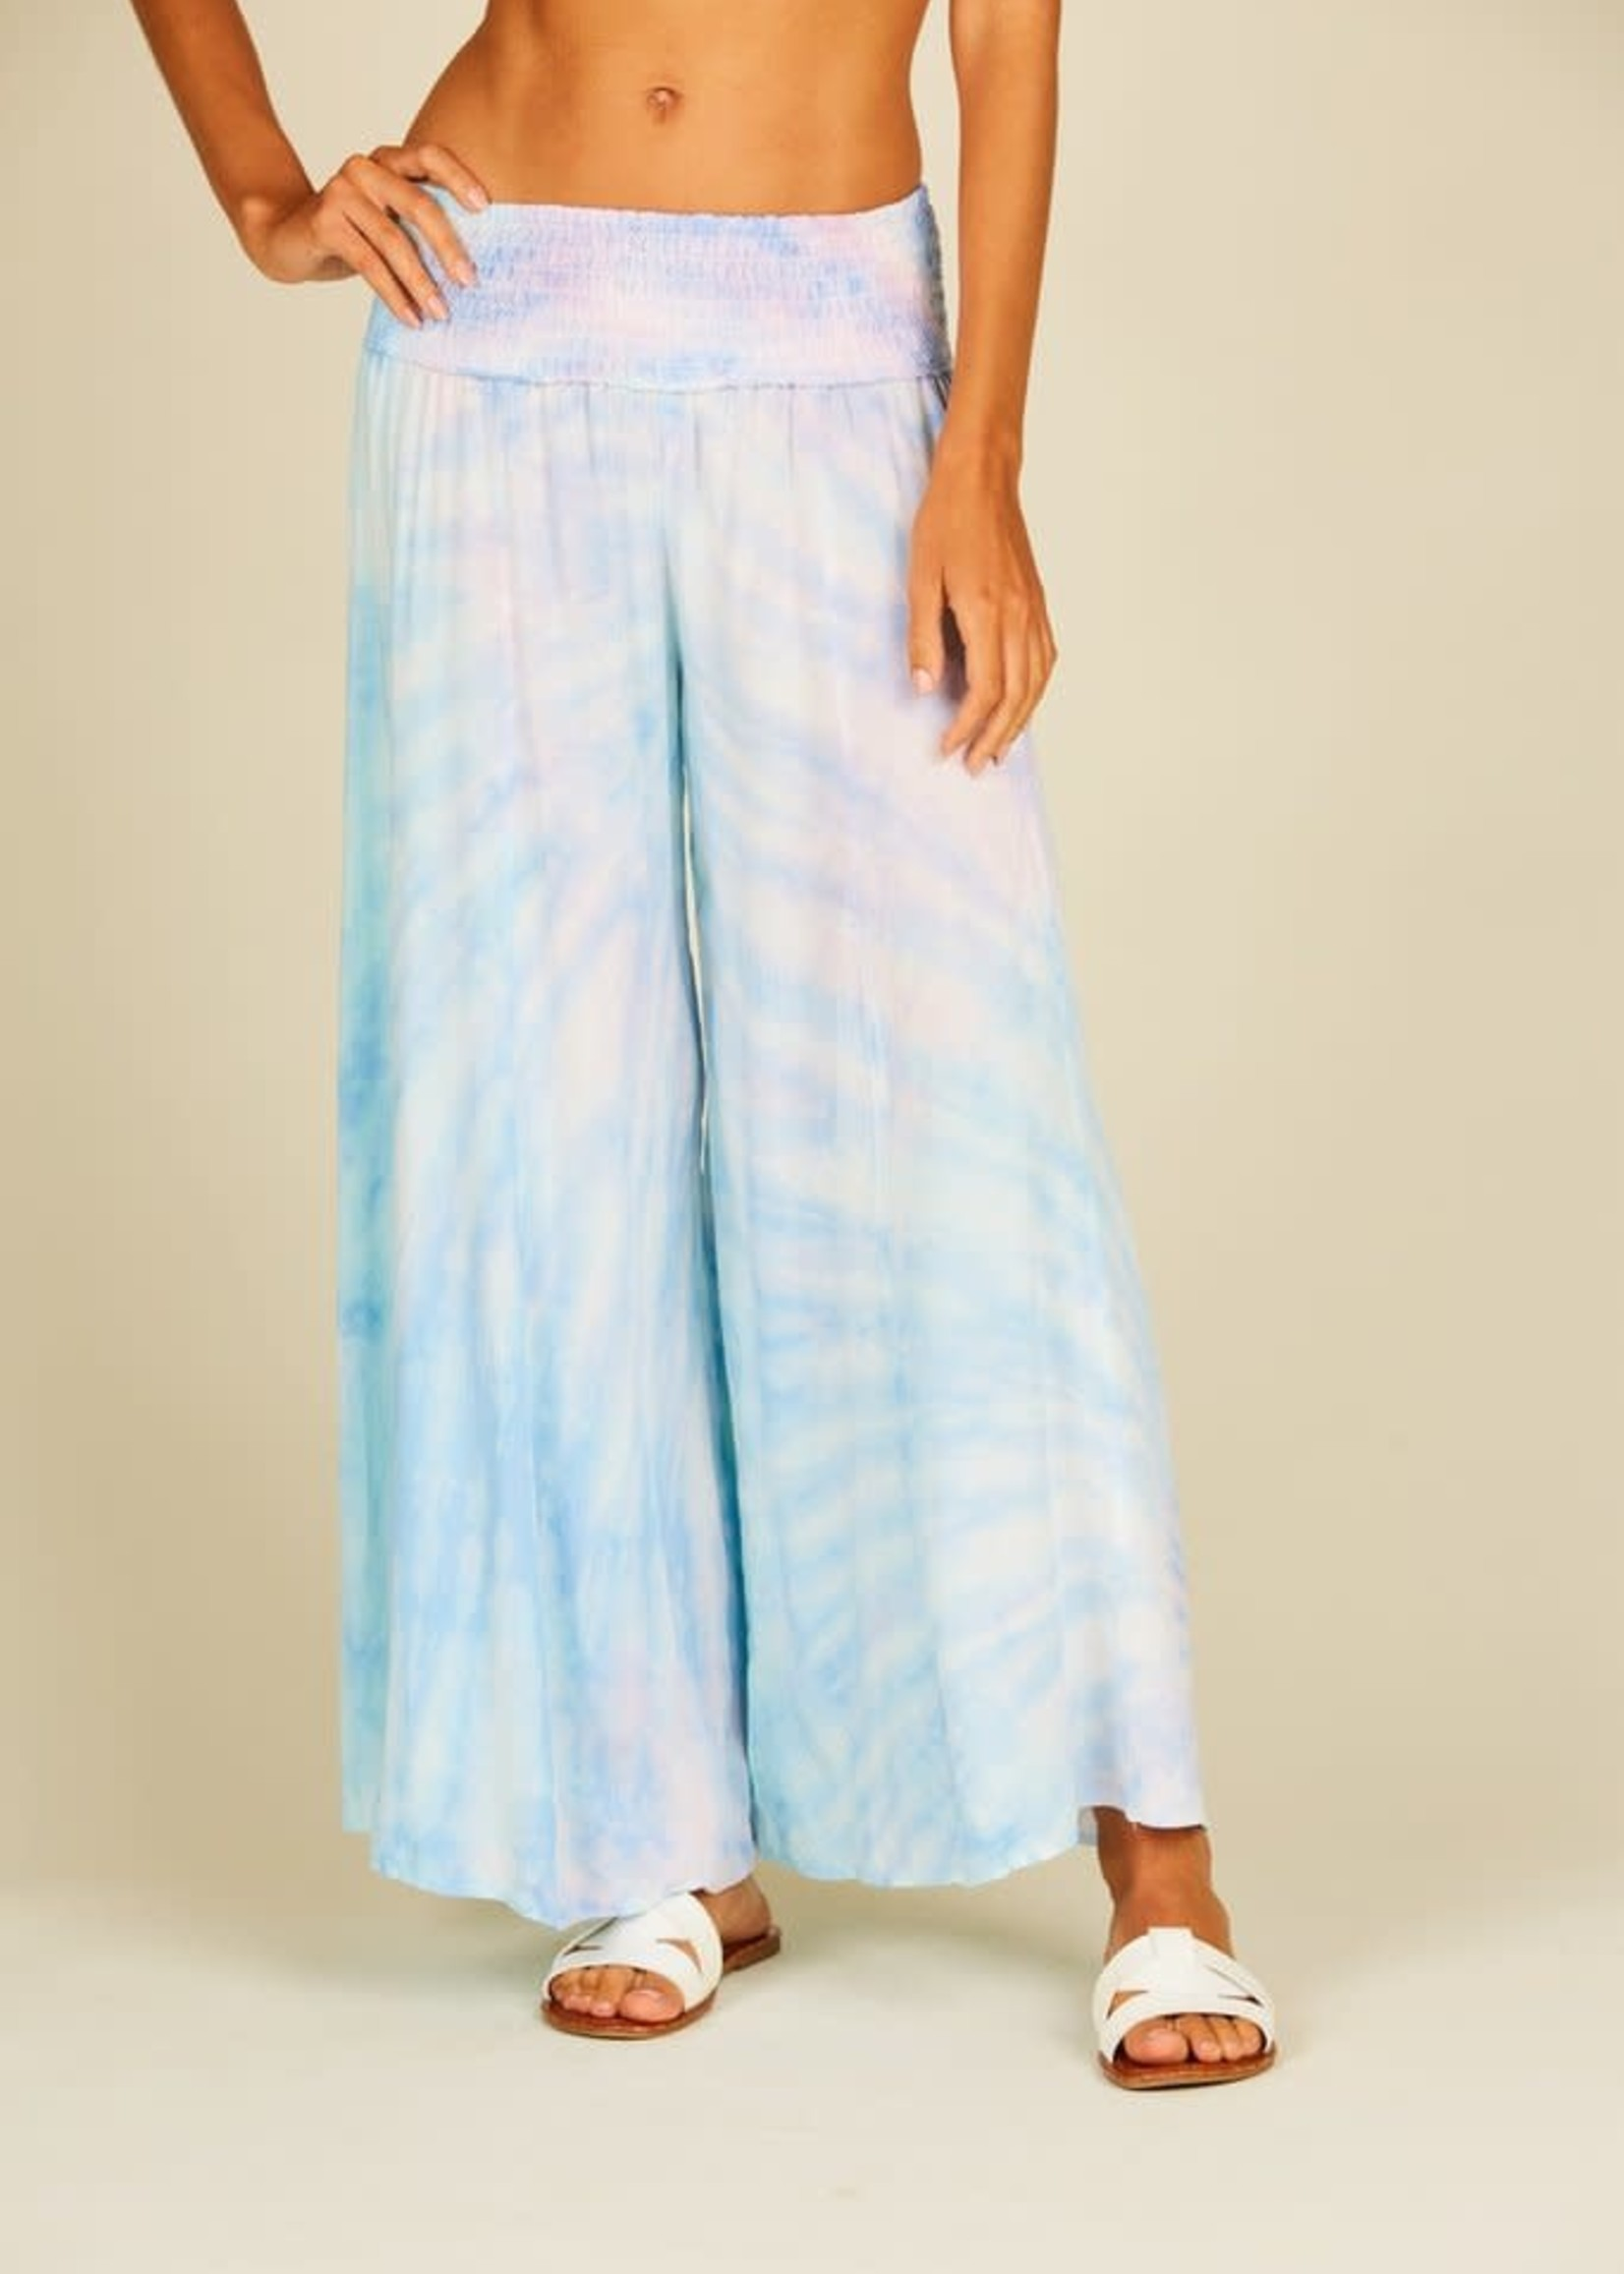 Surf Gypsy Tulum Lavender Tie Dye Wide Leg Pant